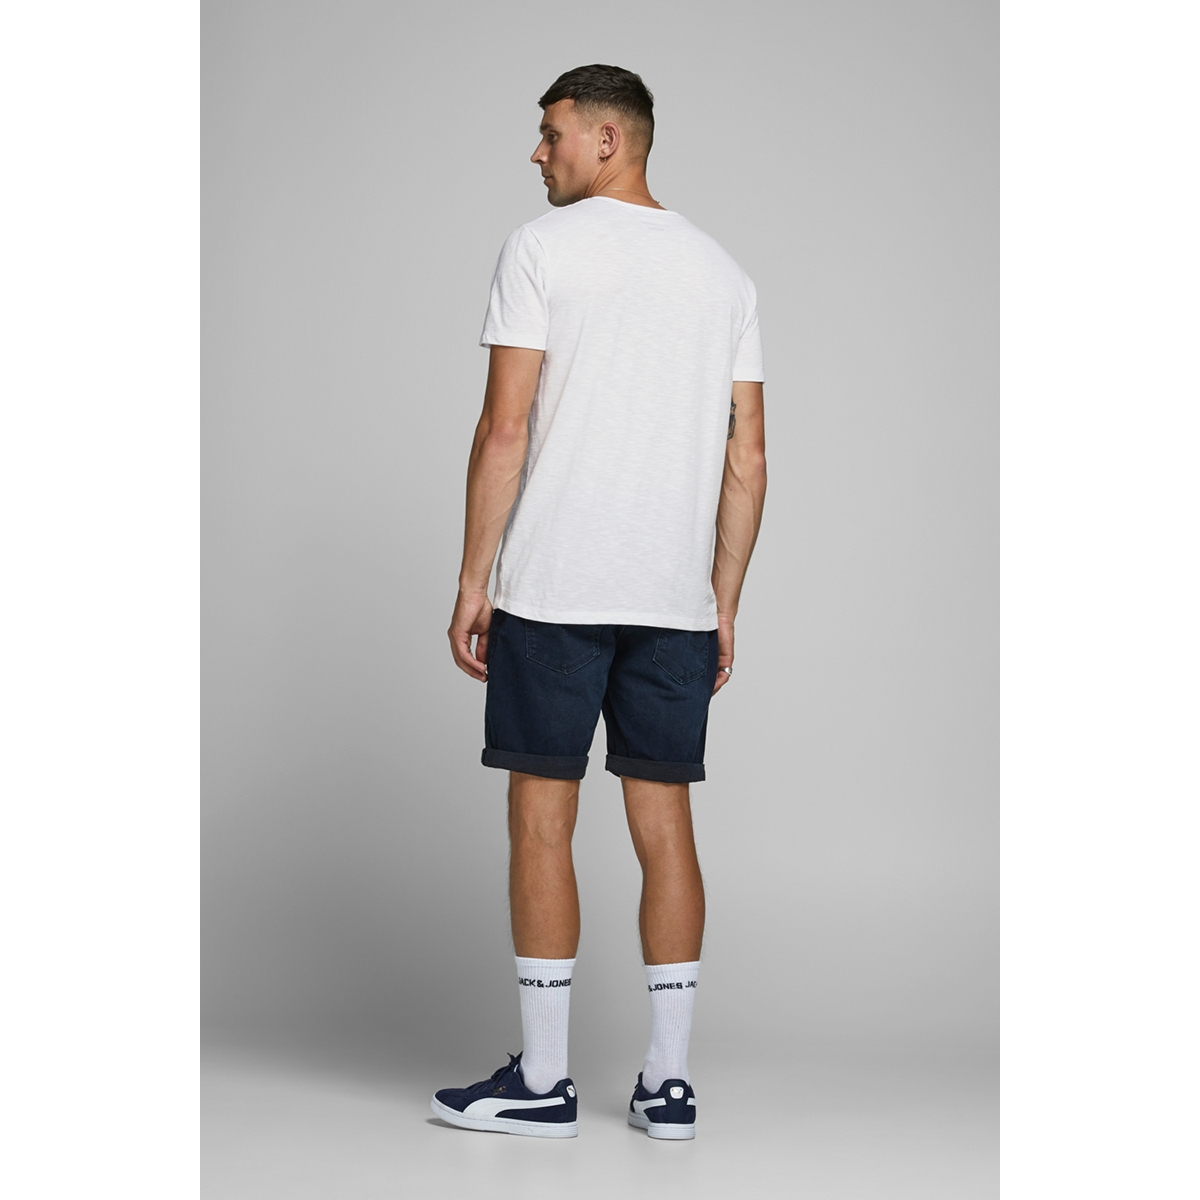 jjjones tee ss crew neck 12175124 jack & jones t-shirt white/slim